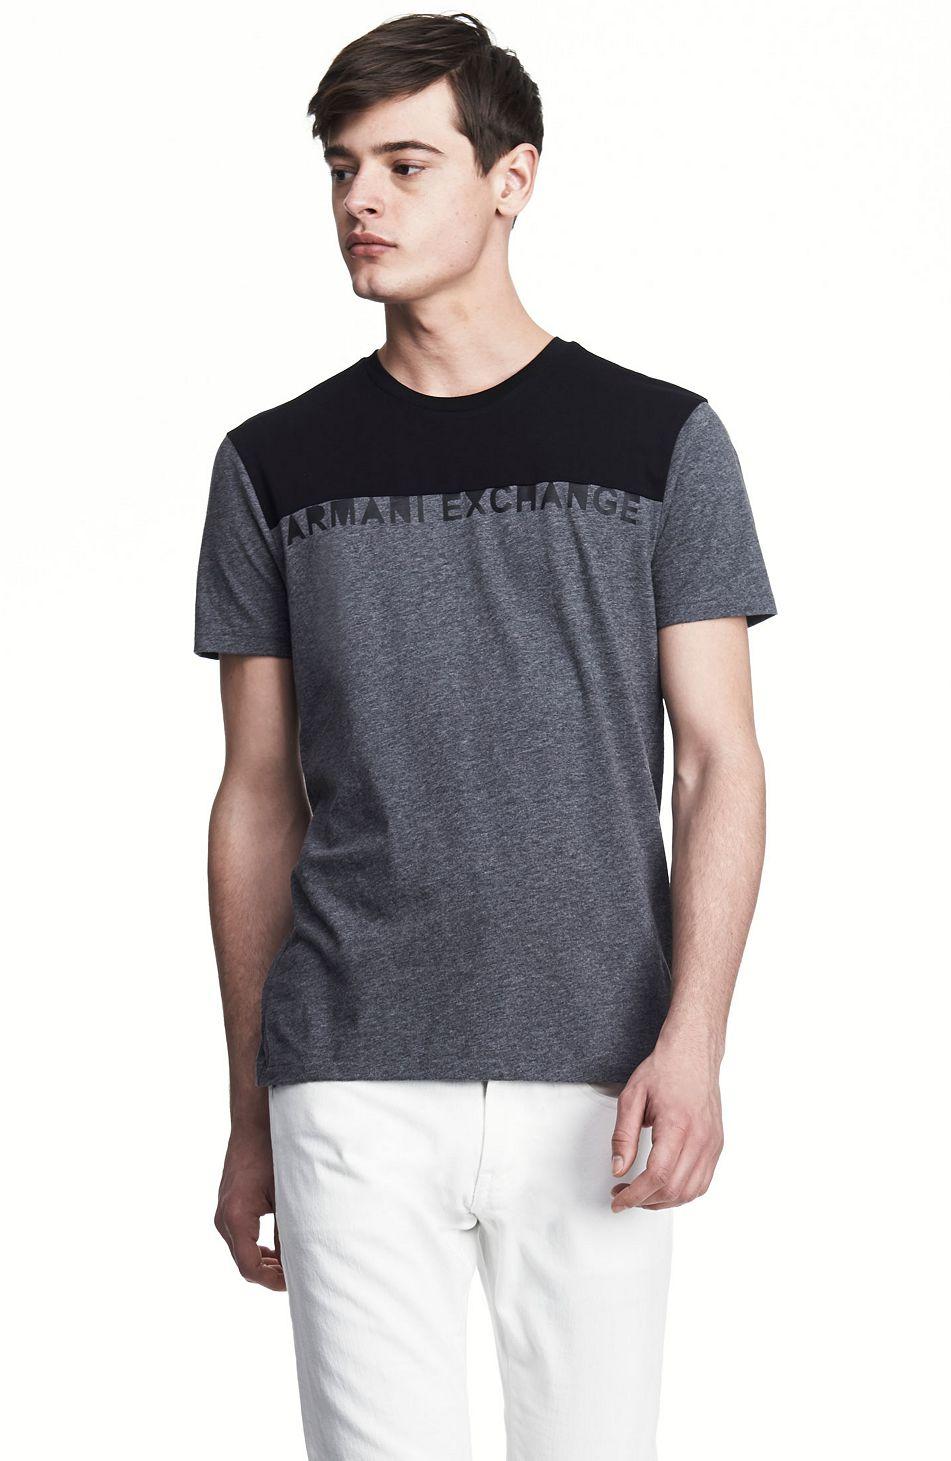 美國百分百【全新真品】Armani Exchange T恤 AX 短袖 上衣 T-shirt 亞曼尼 深灰 黑 Logo 文字 M號 F344